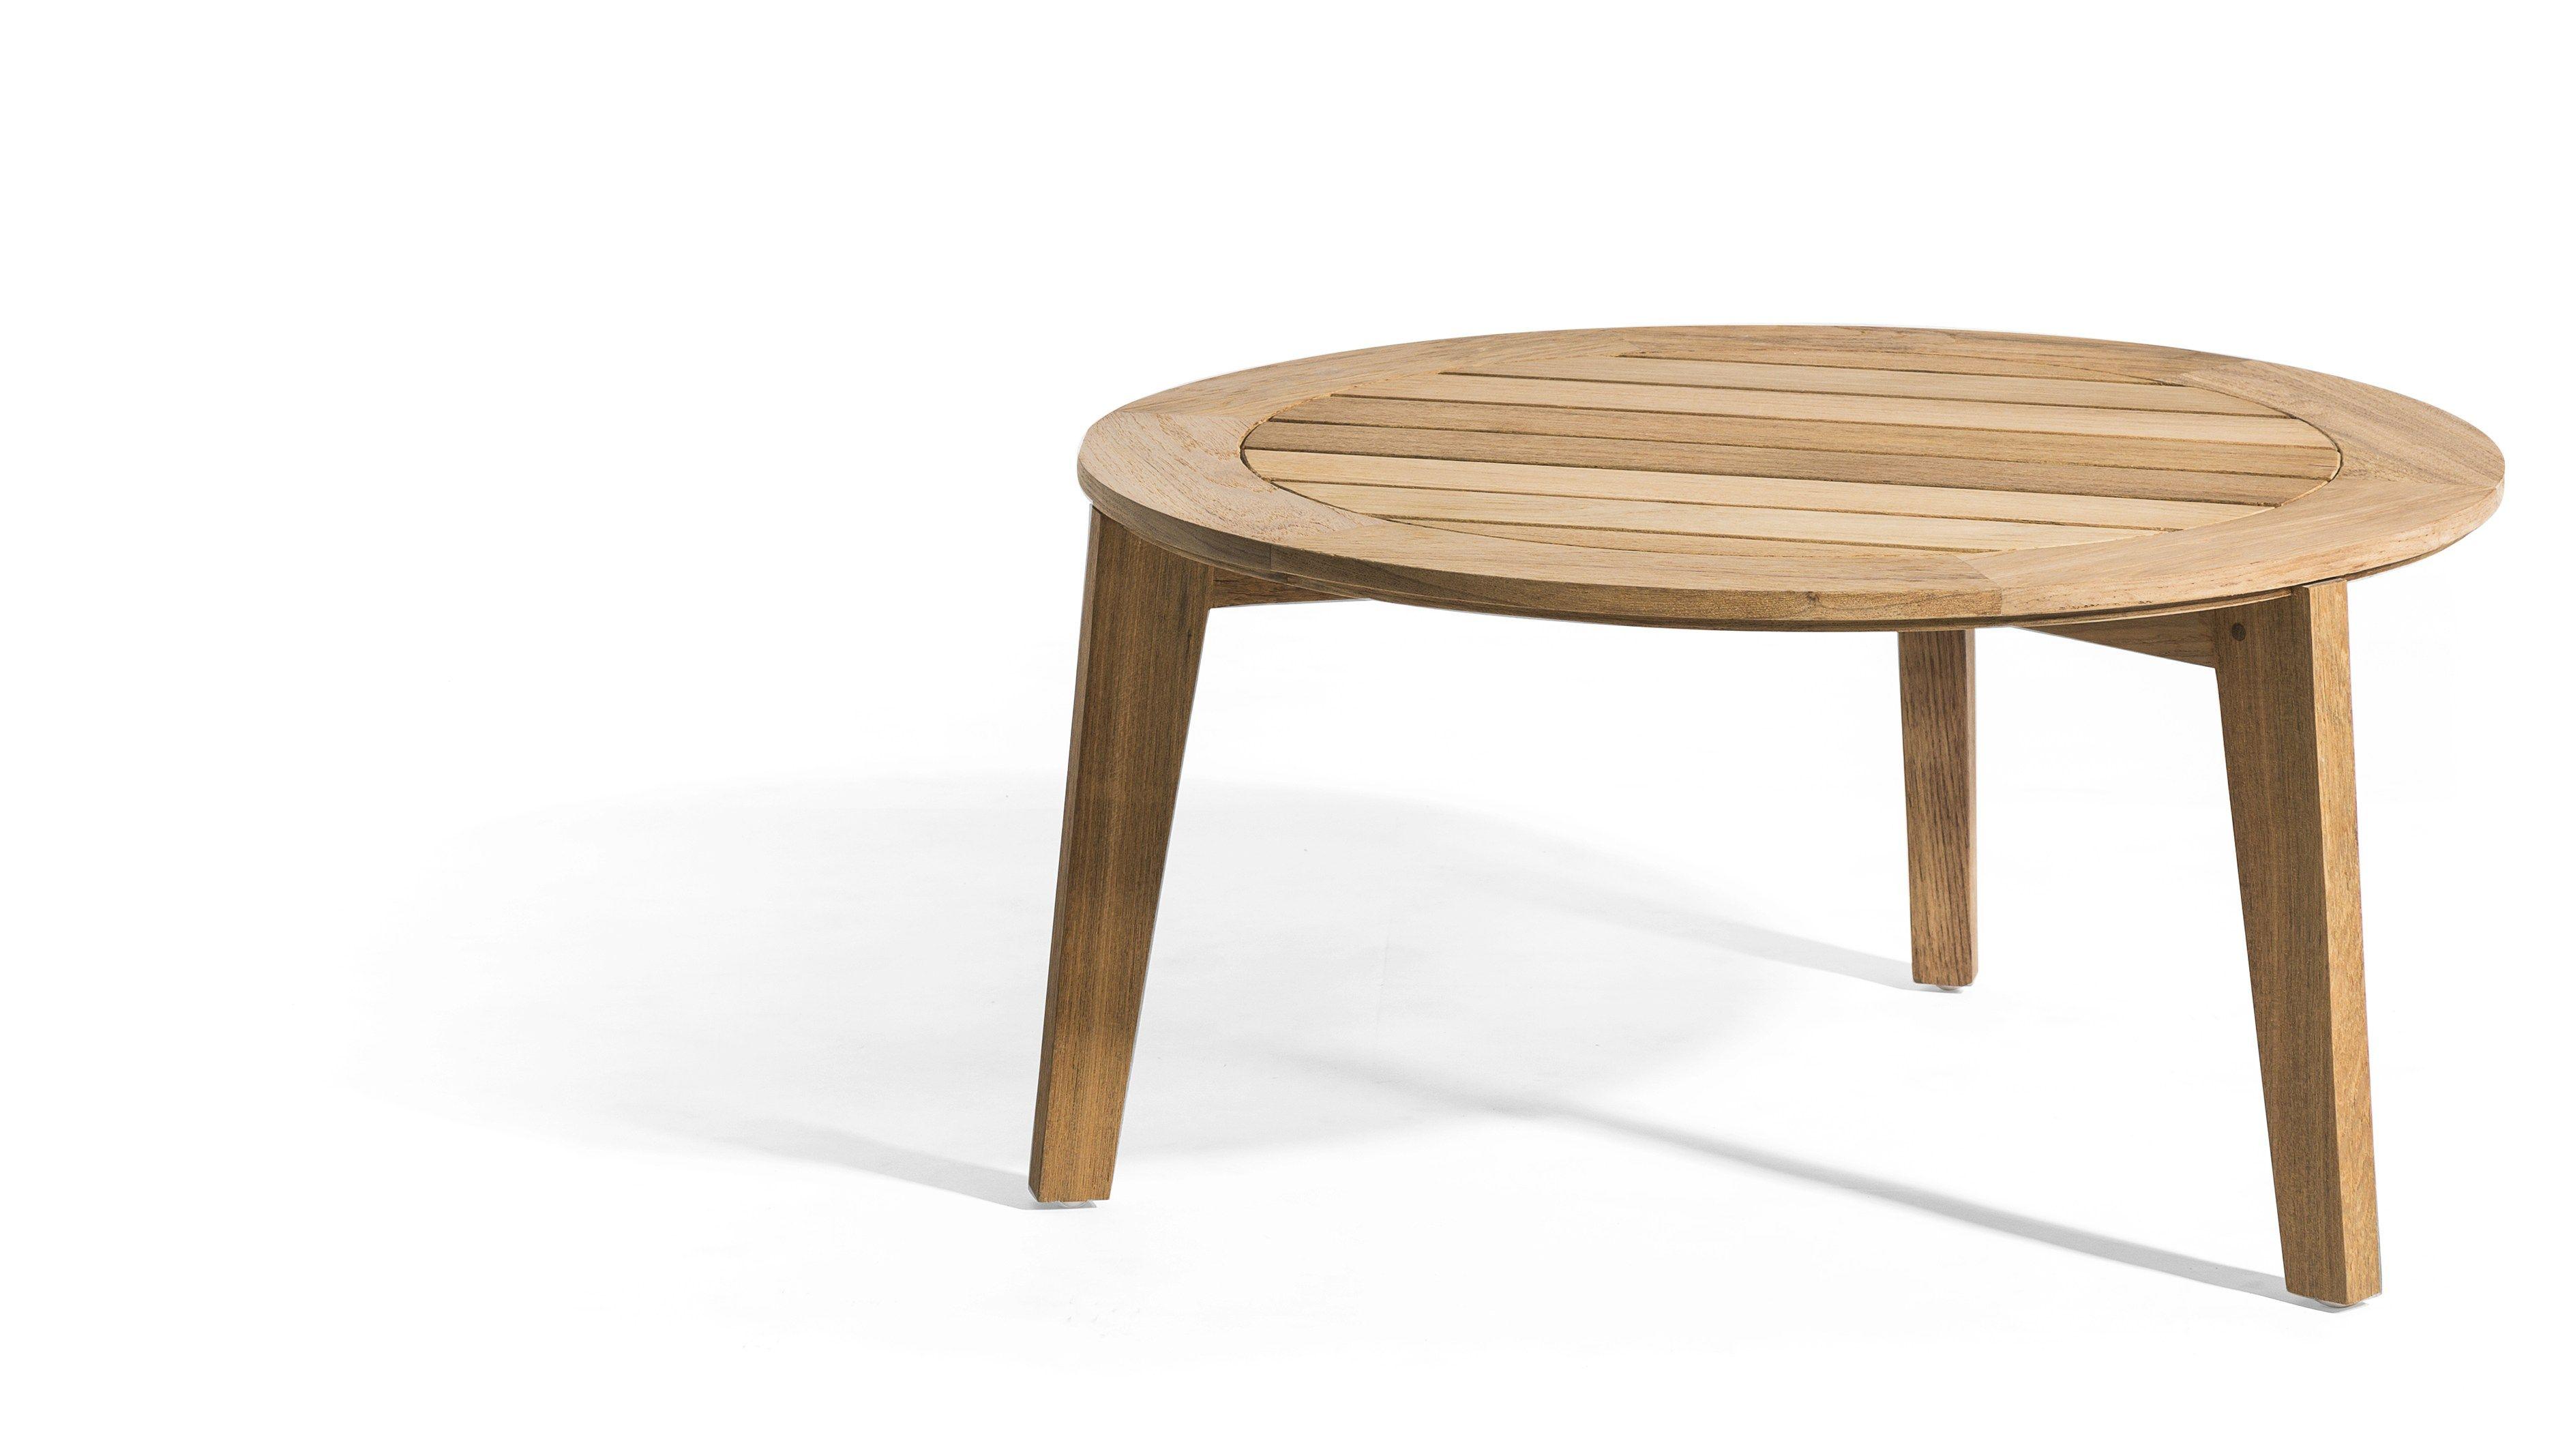 Attol teak coffee table by oasiq design hugo de ruiter for Table basse round